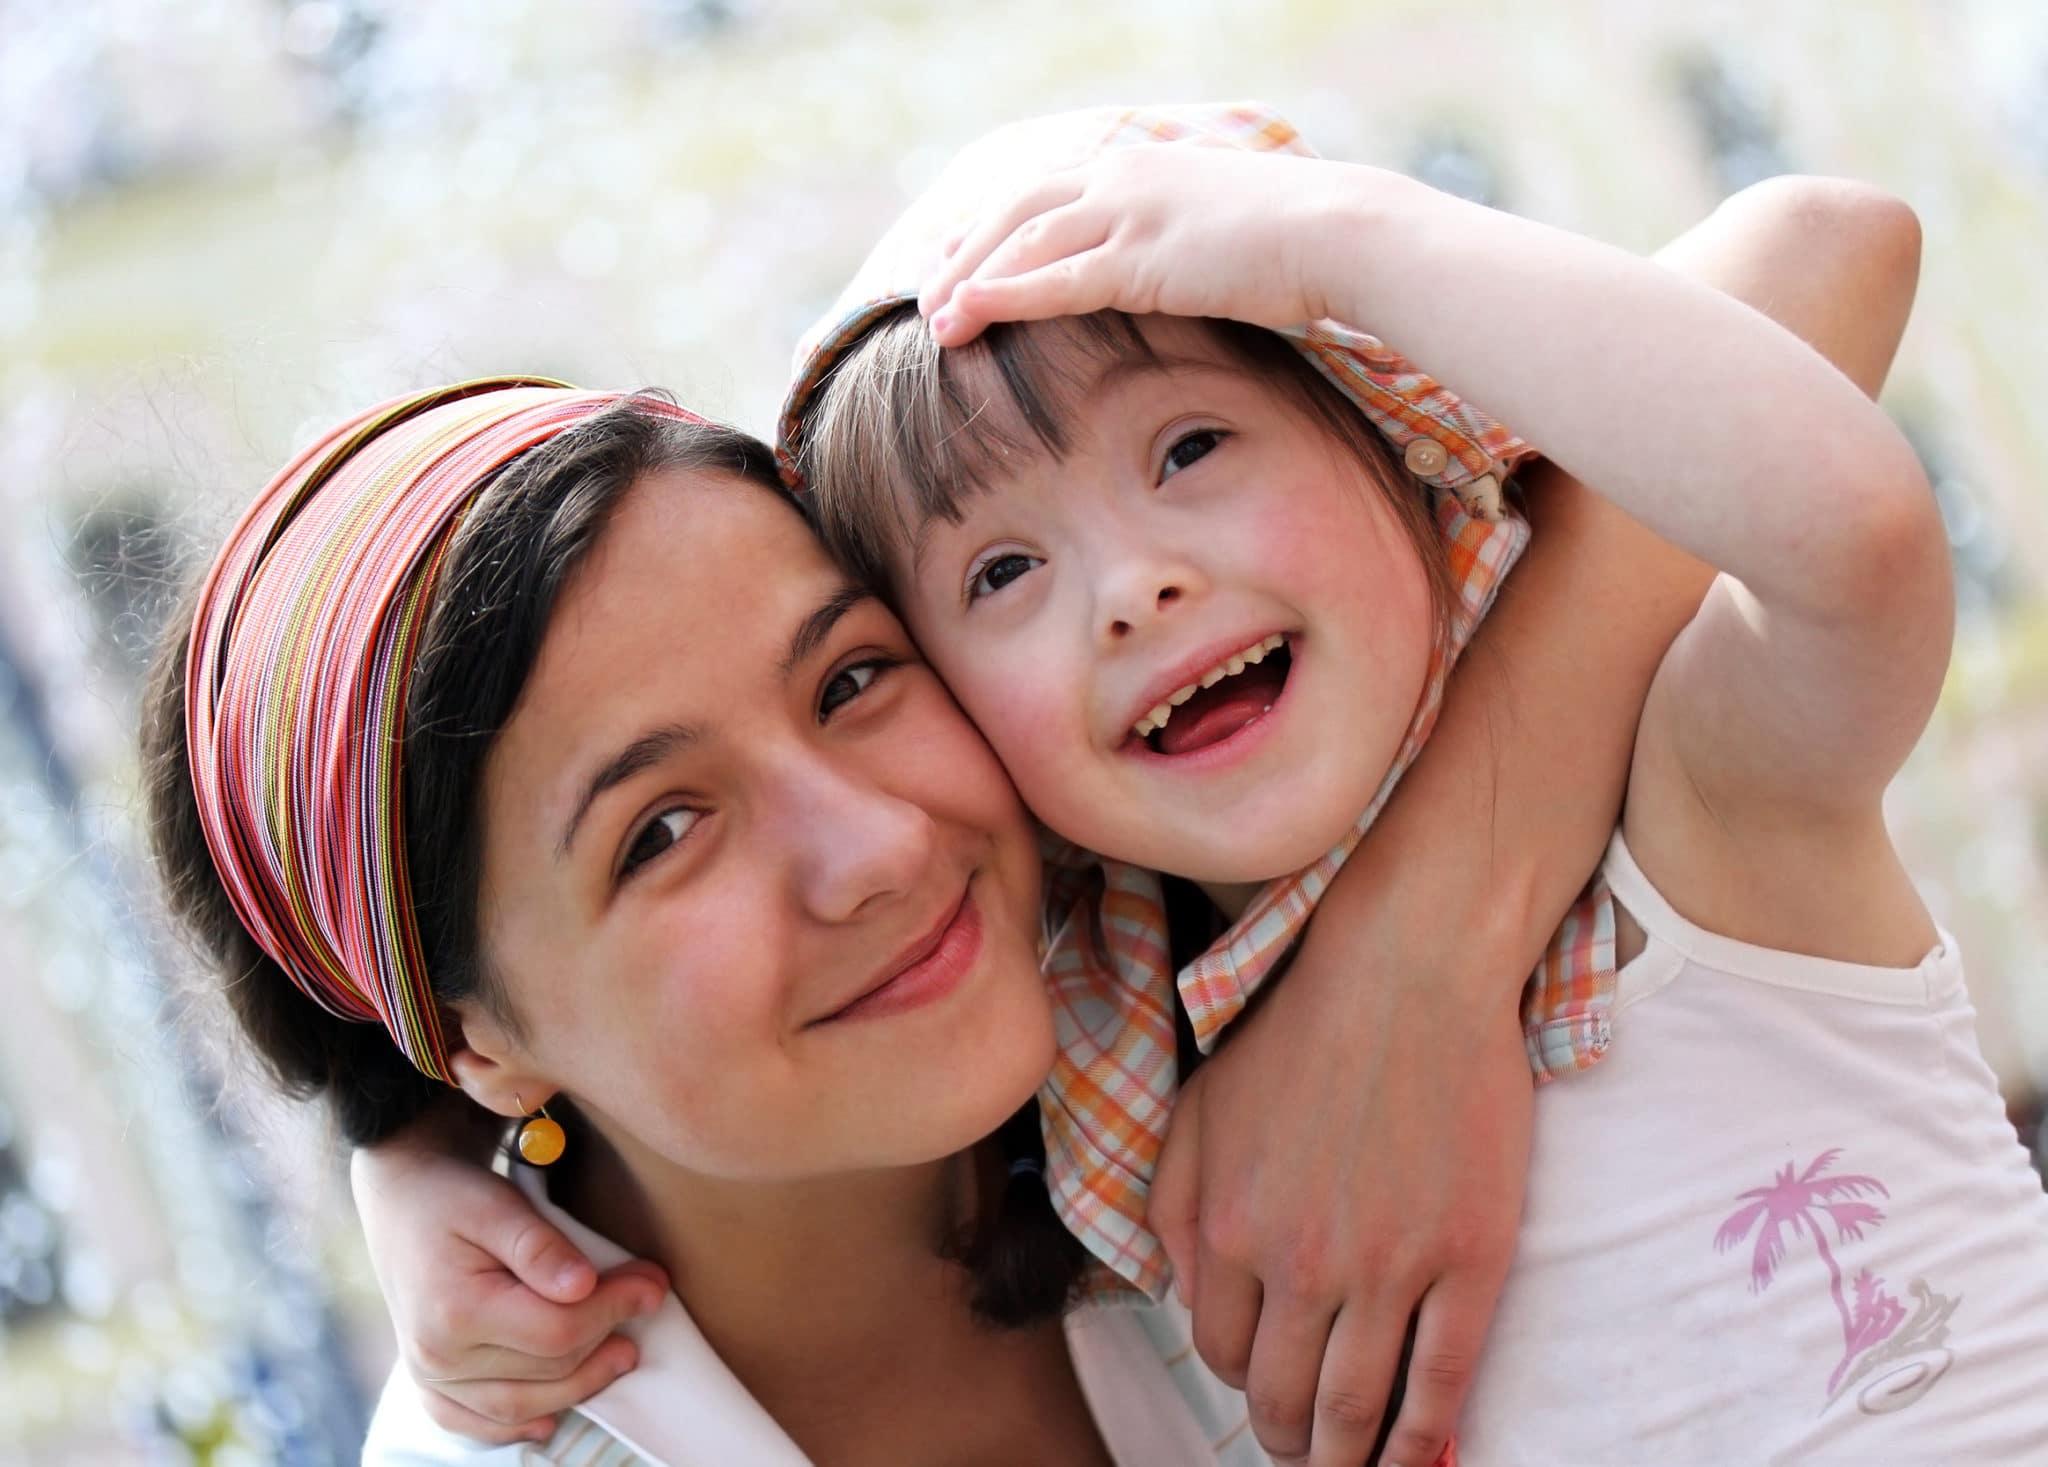 Developmental Disabilities Care Management in Indianapolis Area